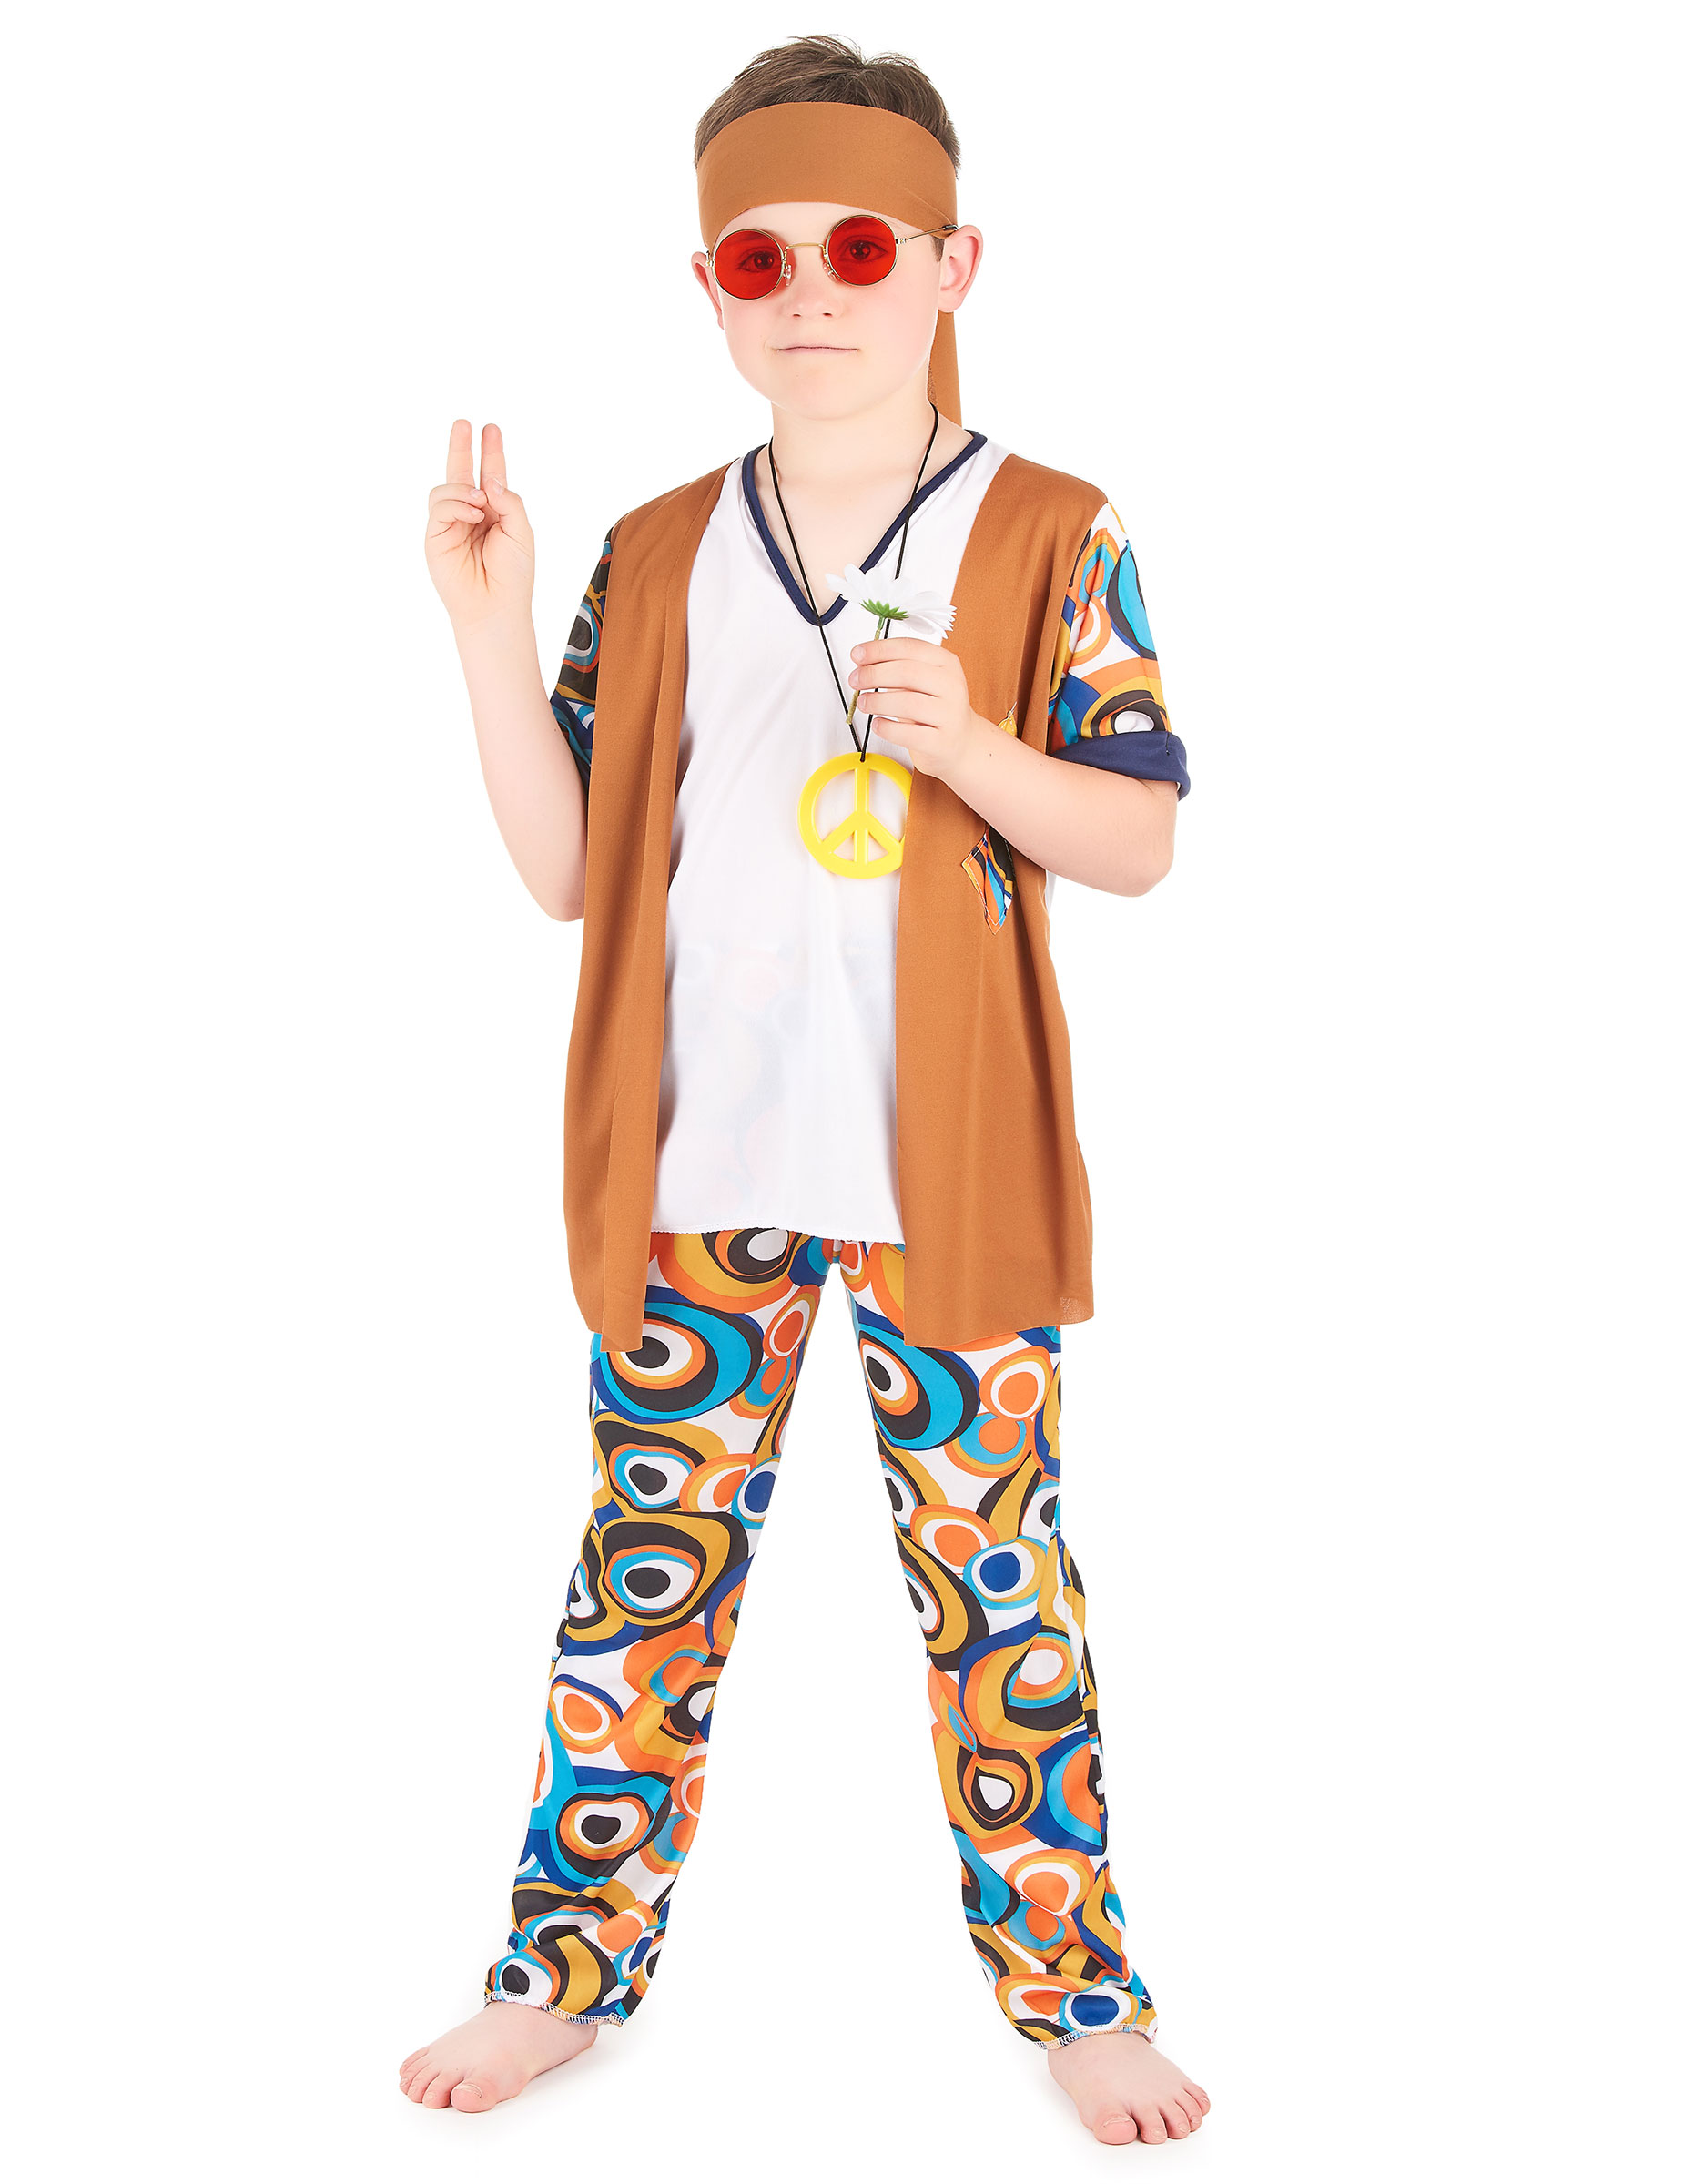 Costume Hippy bambino Costumi bambinie vestiti di carnevale online - Vegaoo